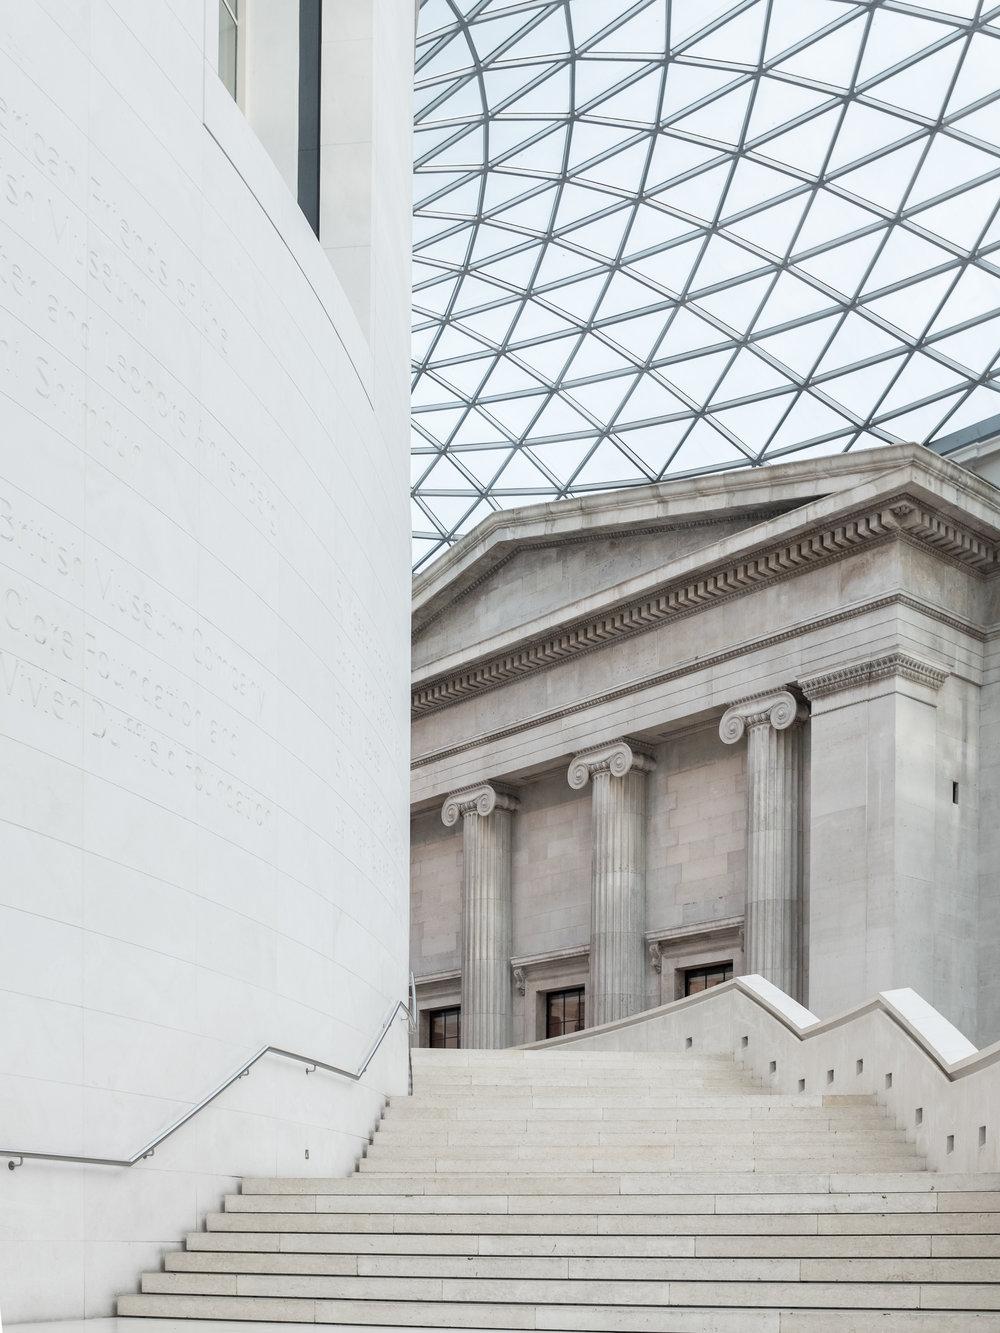 British Museum by Handover-1.jpg